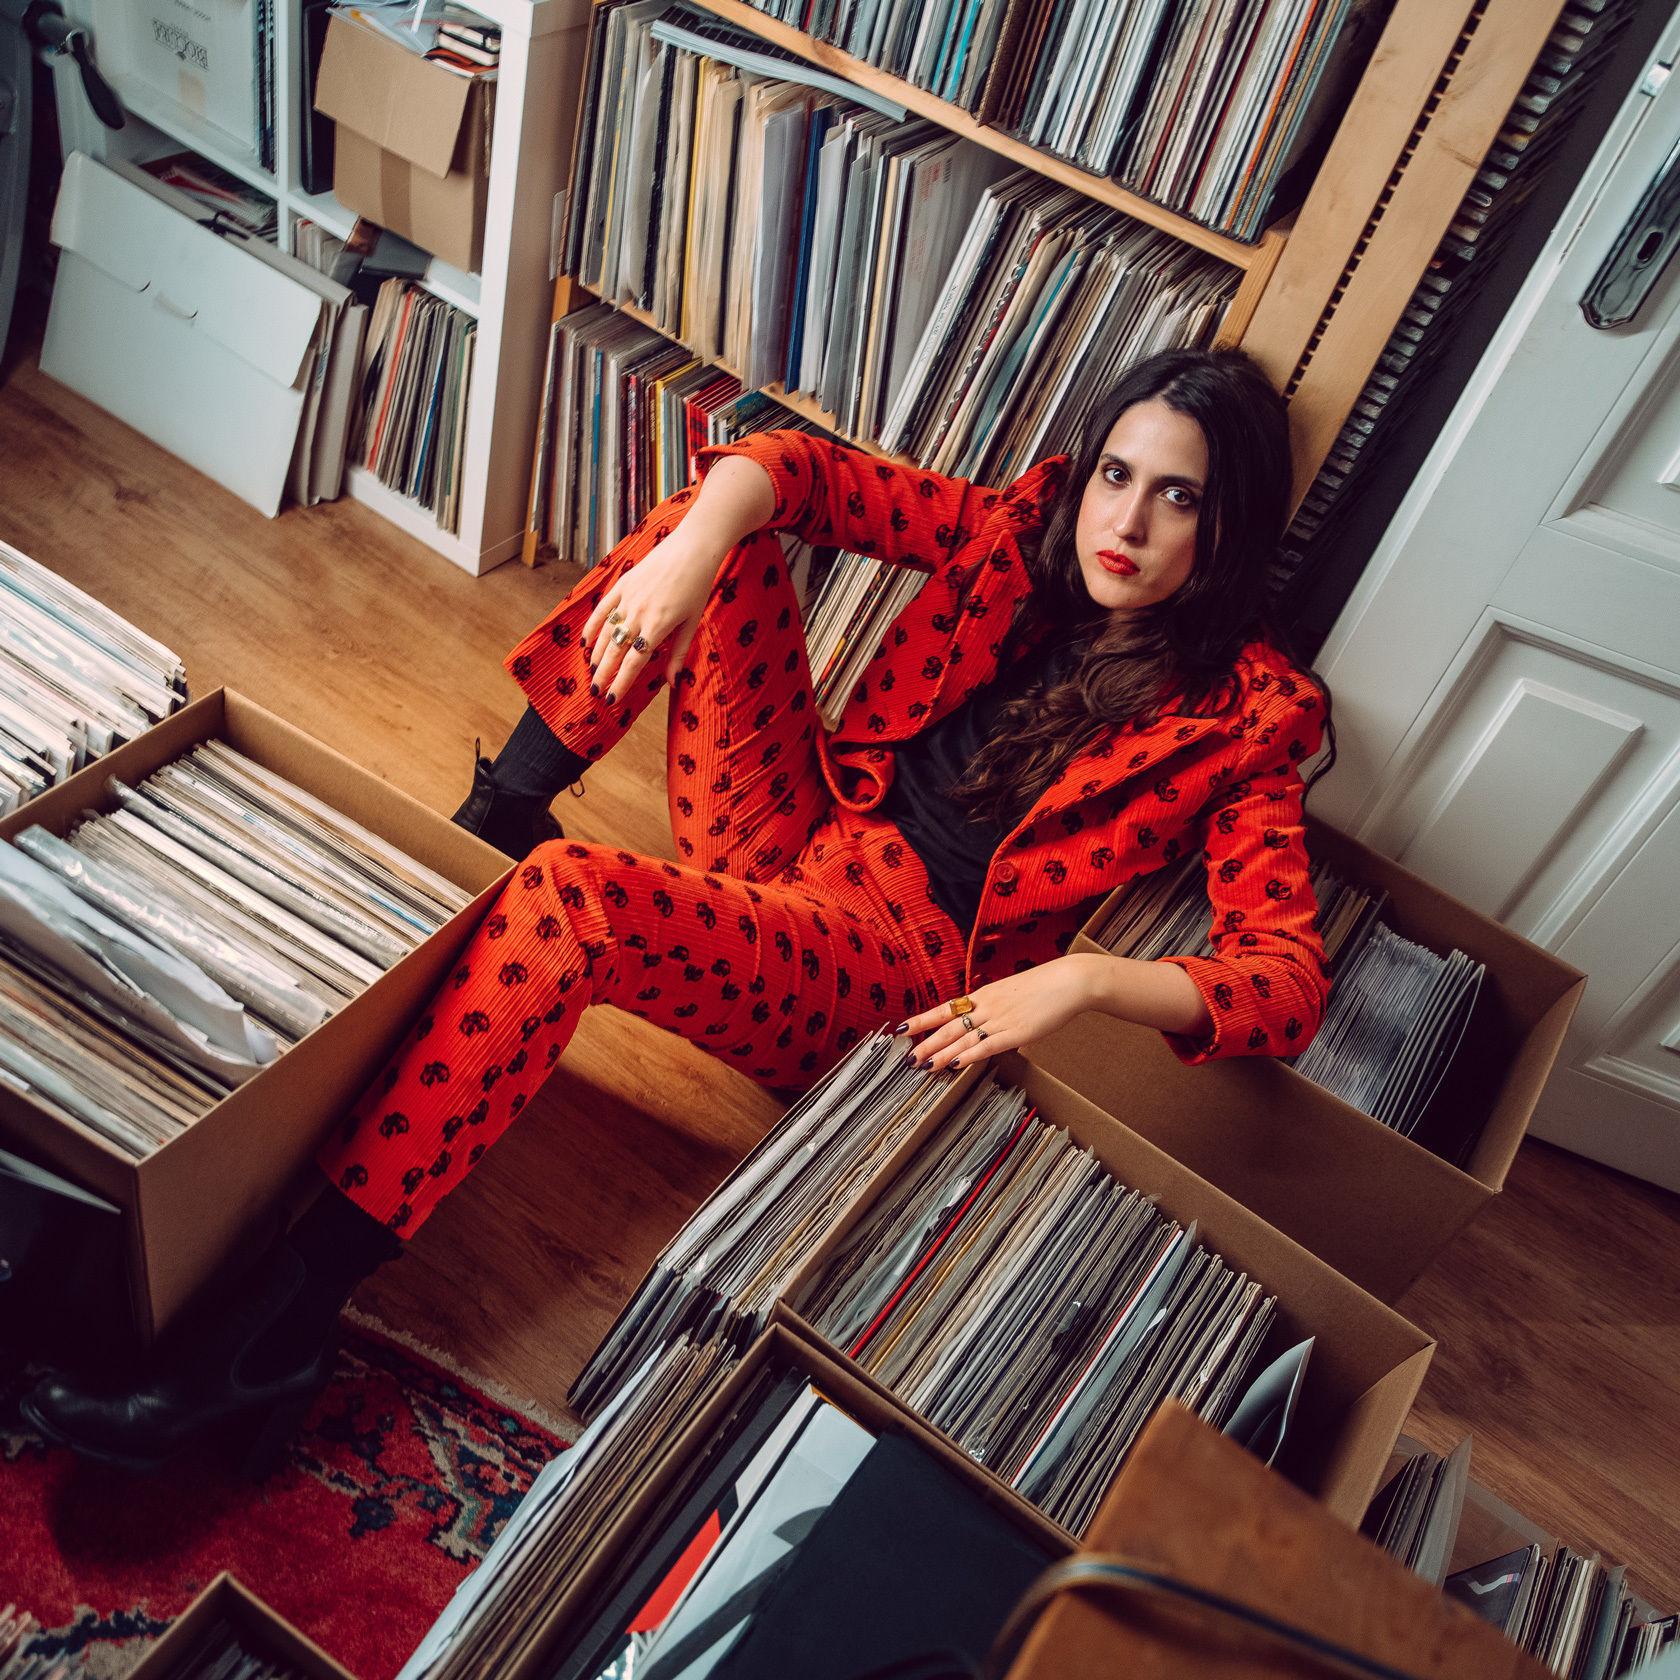 Jonas Holthaus c/o FREDA+WOOLF for Rolling Stone Magazine